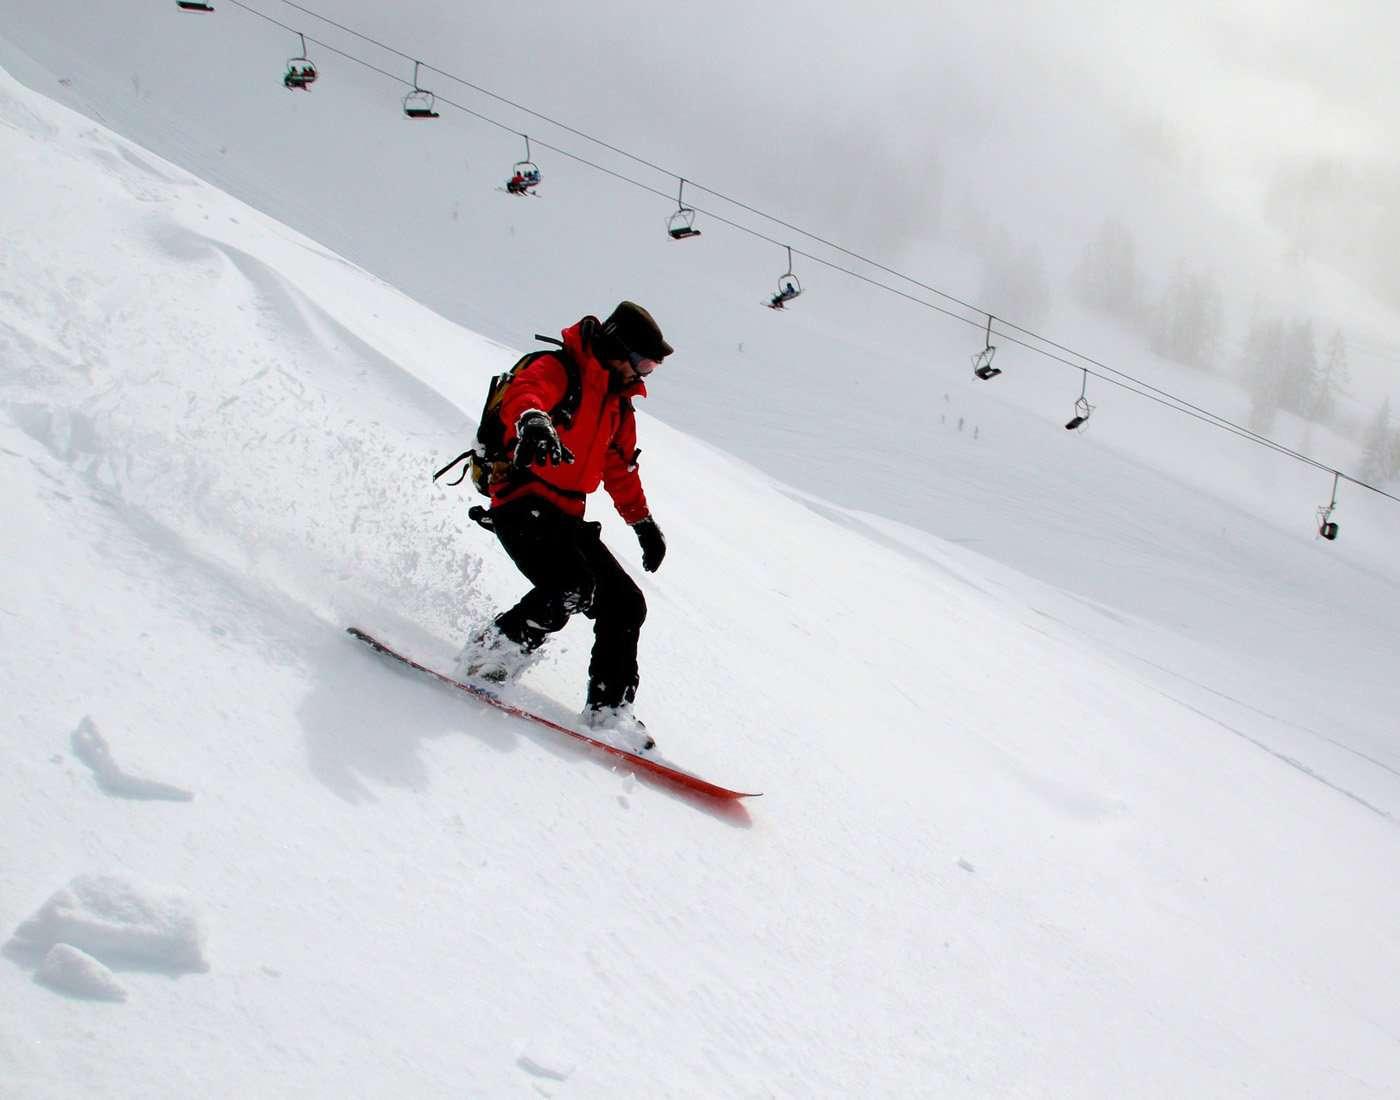 Snow boarding sports